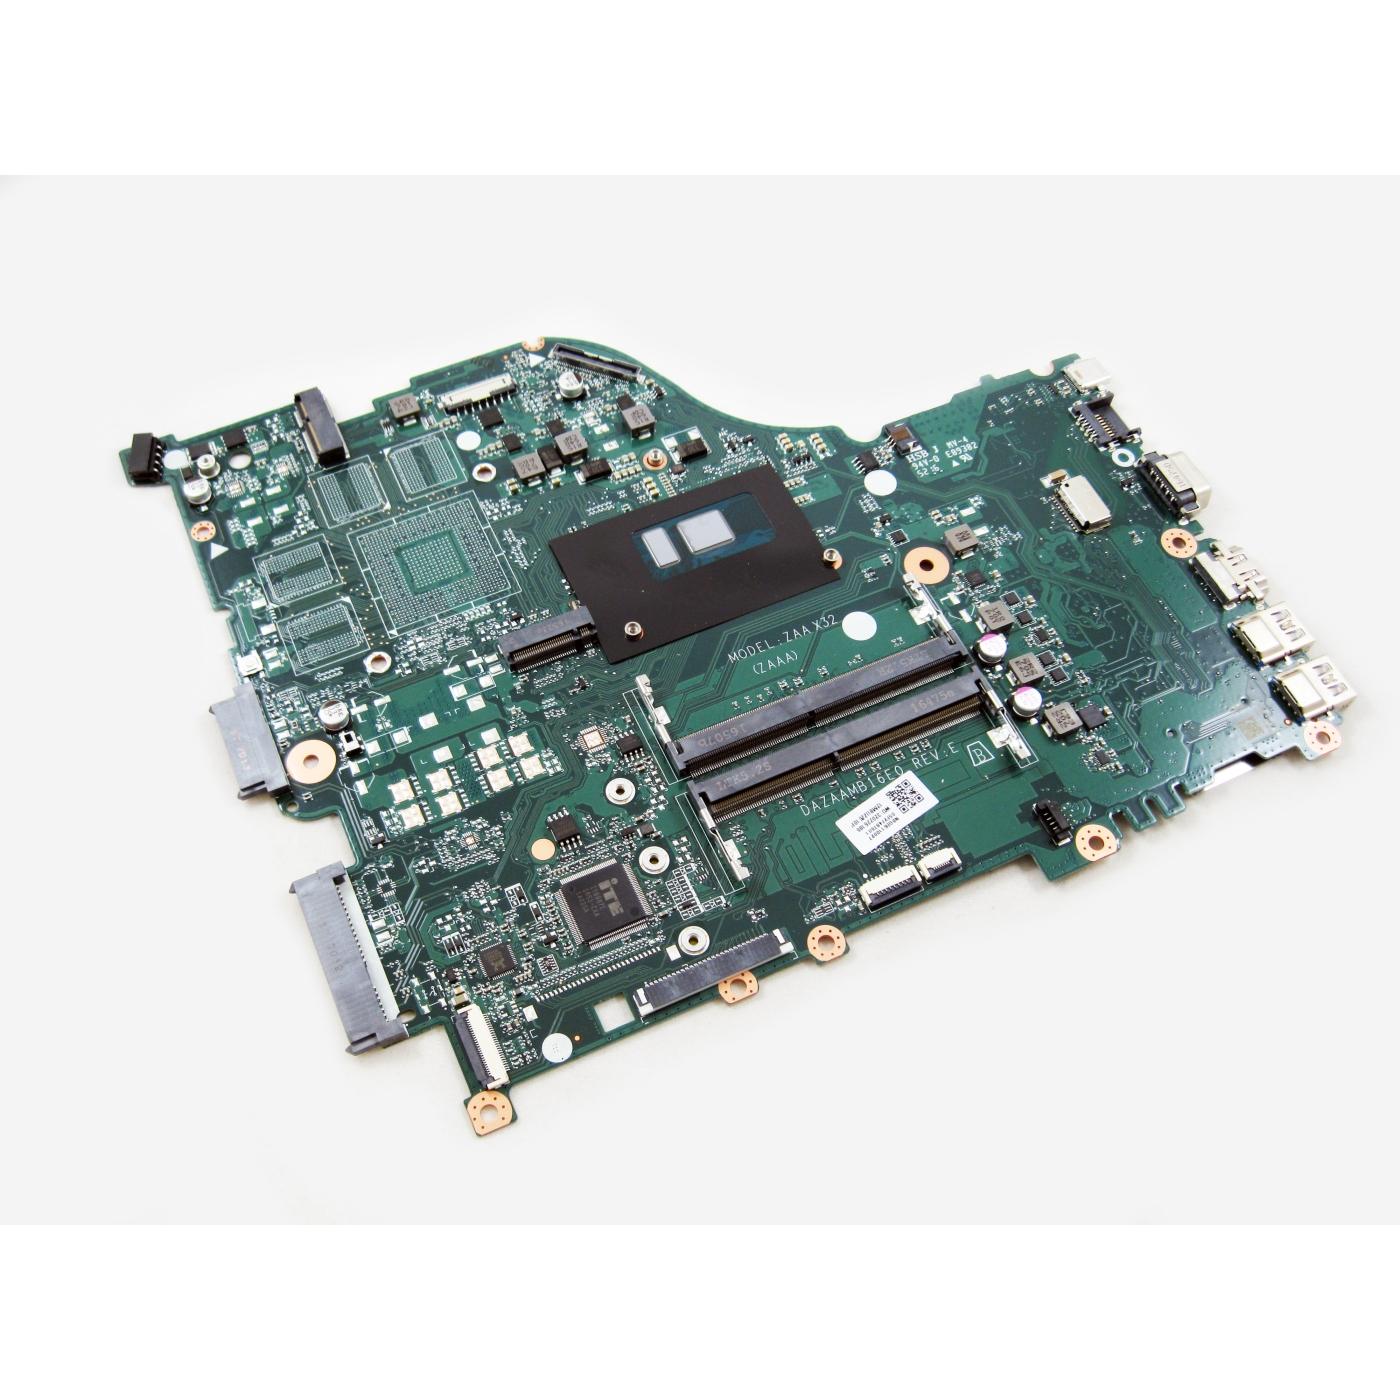 Acer NB.GE611.002 Aspire Gateway I5-6200U 3GB Uma Notebook Motherboard